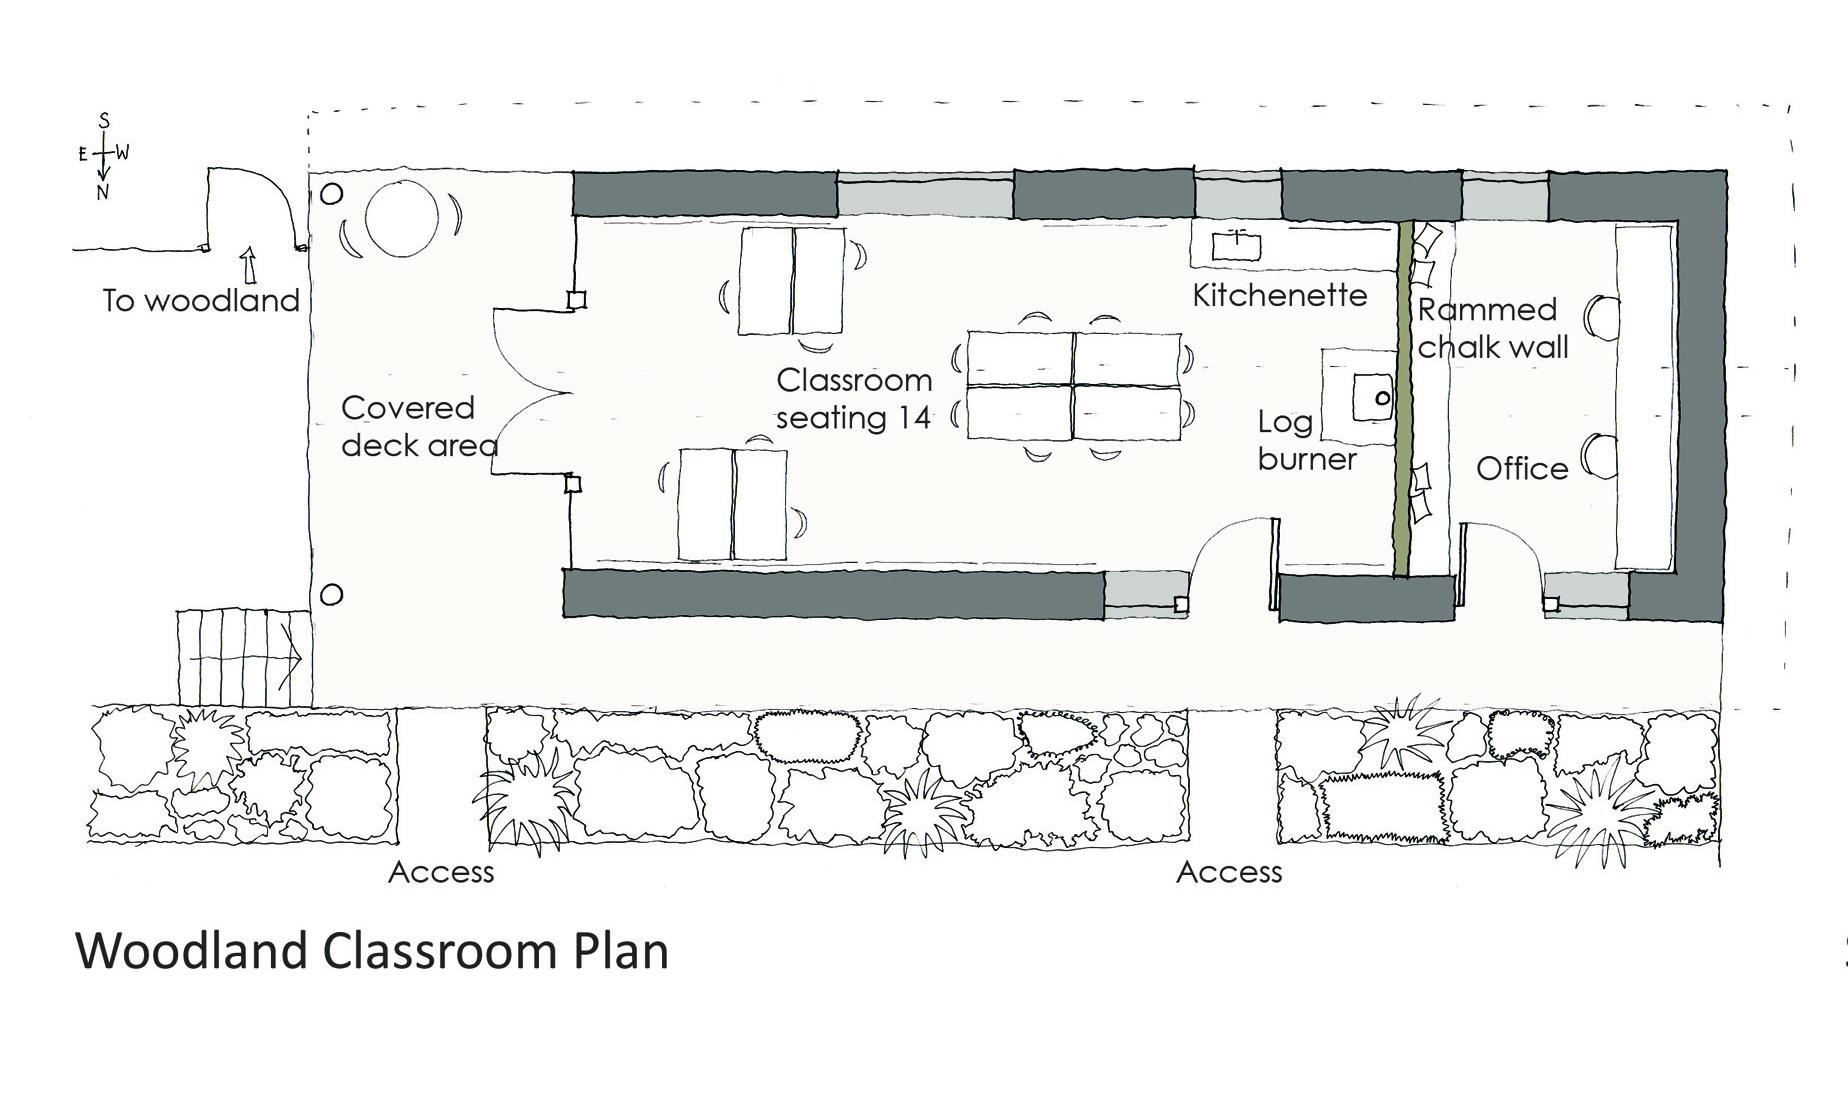 Woodland classroom plan